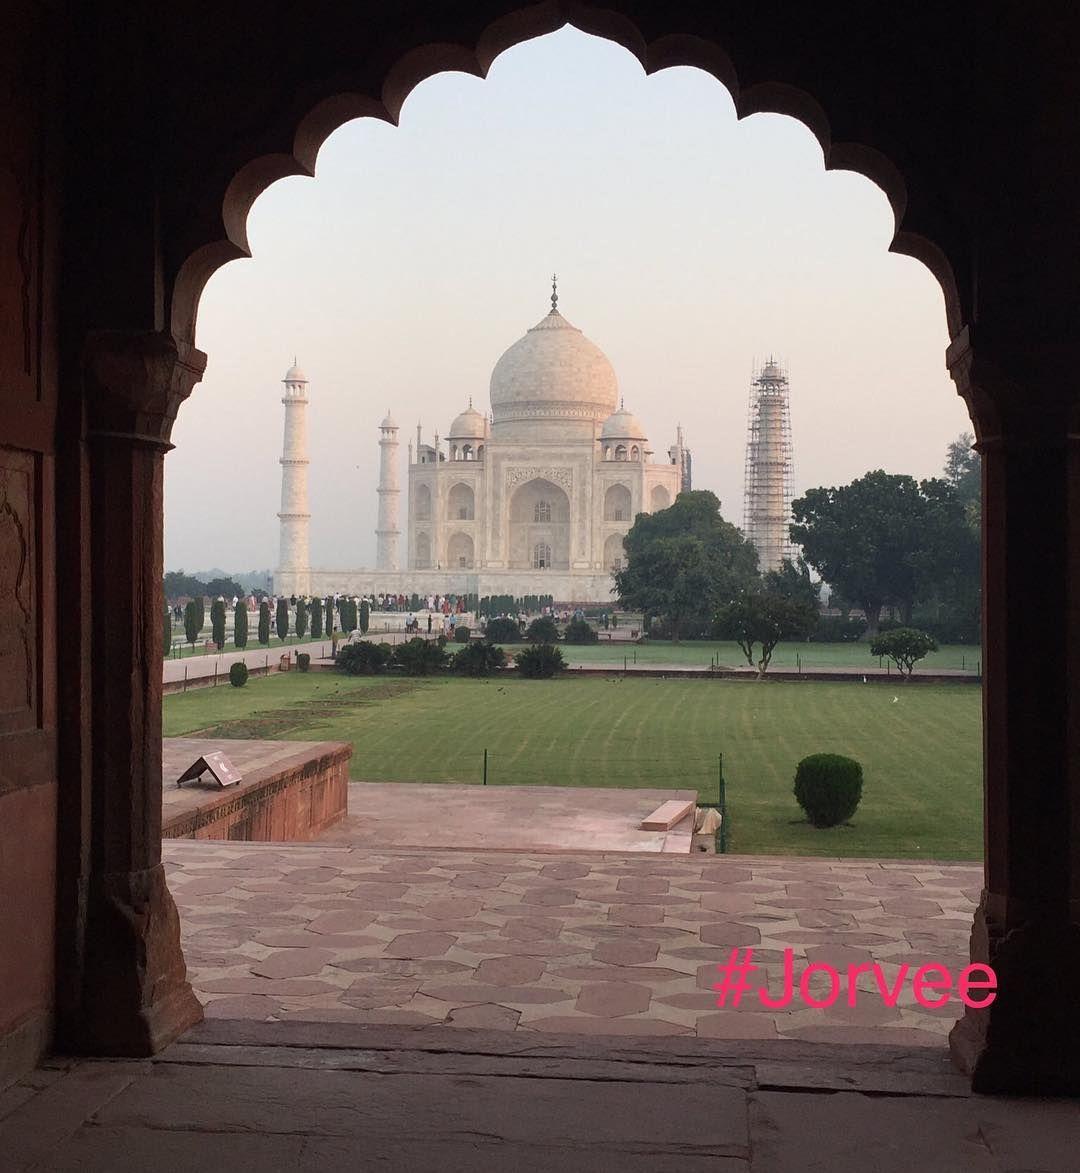 The Taj Mahal - Symbol of Love  #TajMahal #India #architecture #building #heritage #symboloflove #mughal #shahjahan #agra #taj March 18 2017 at 08:10PM